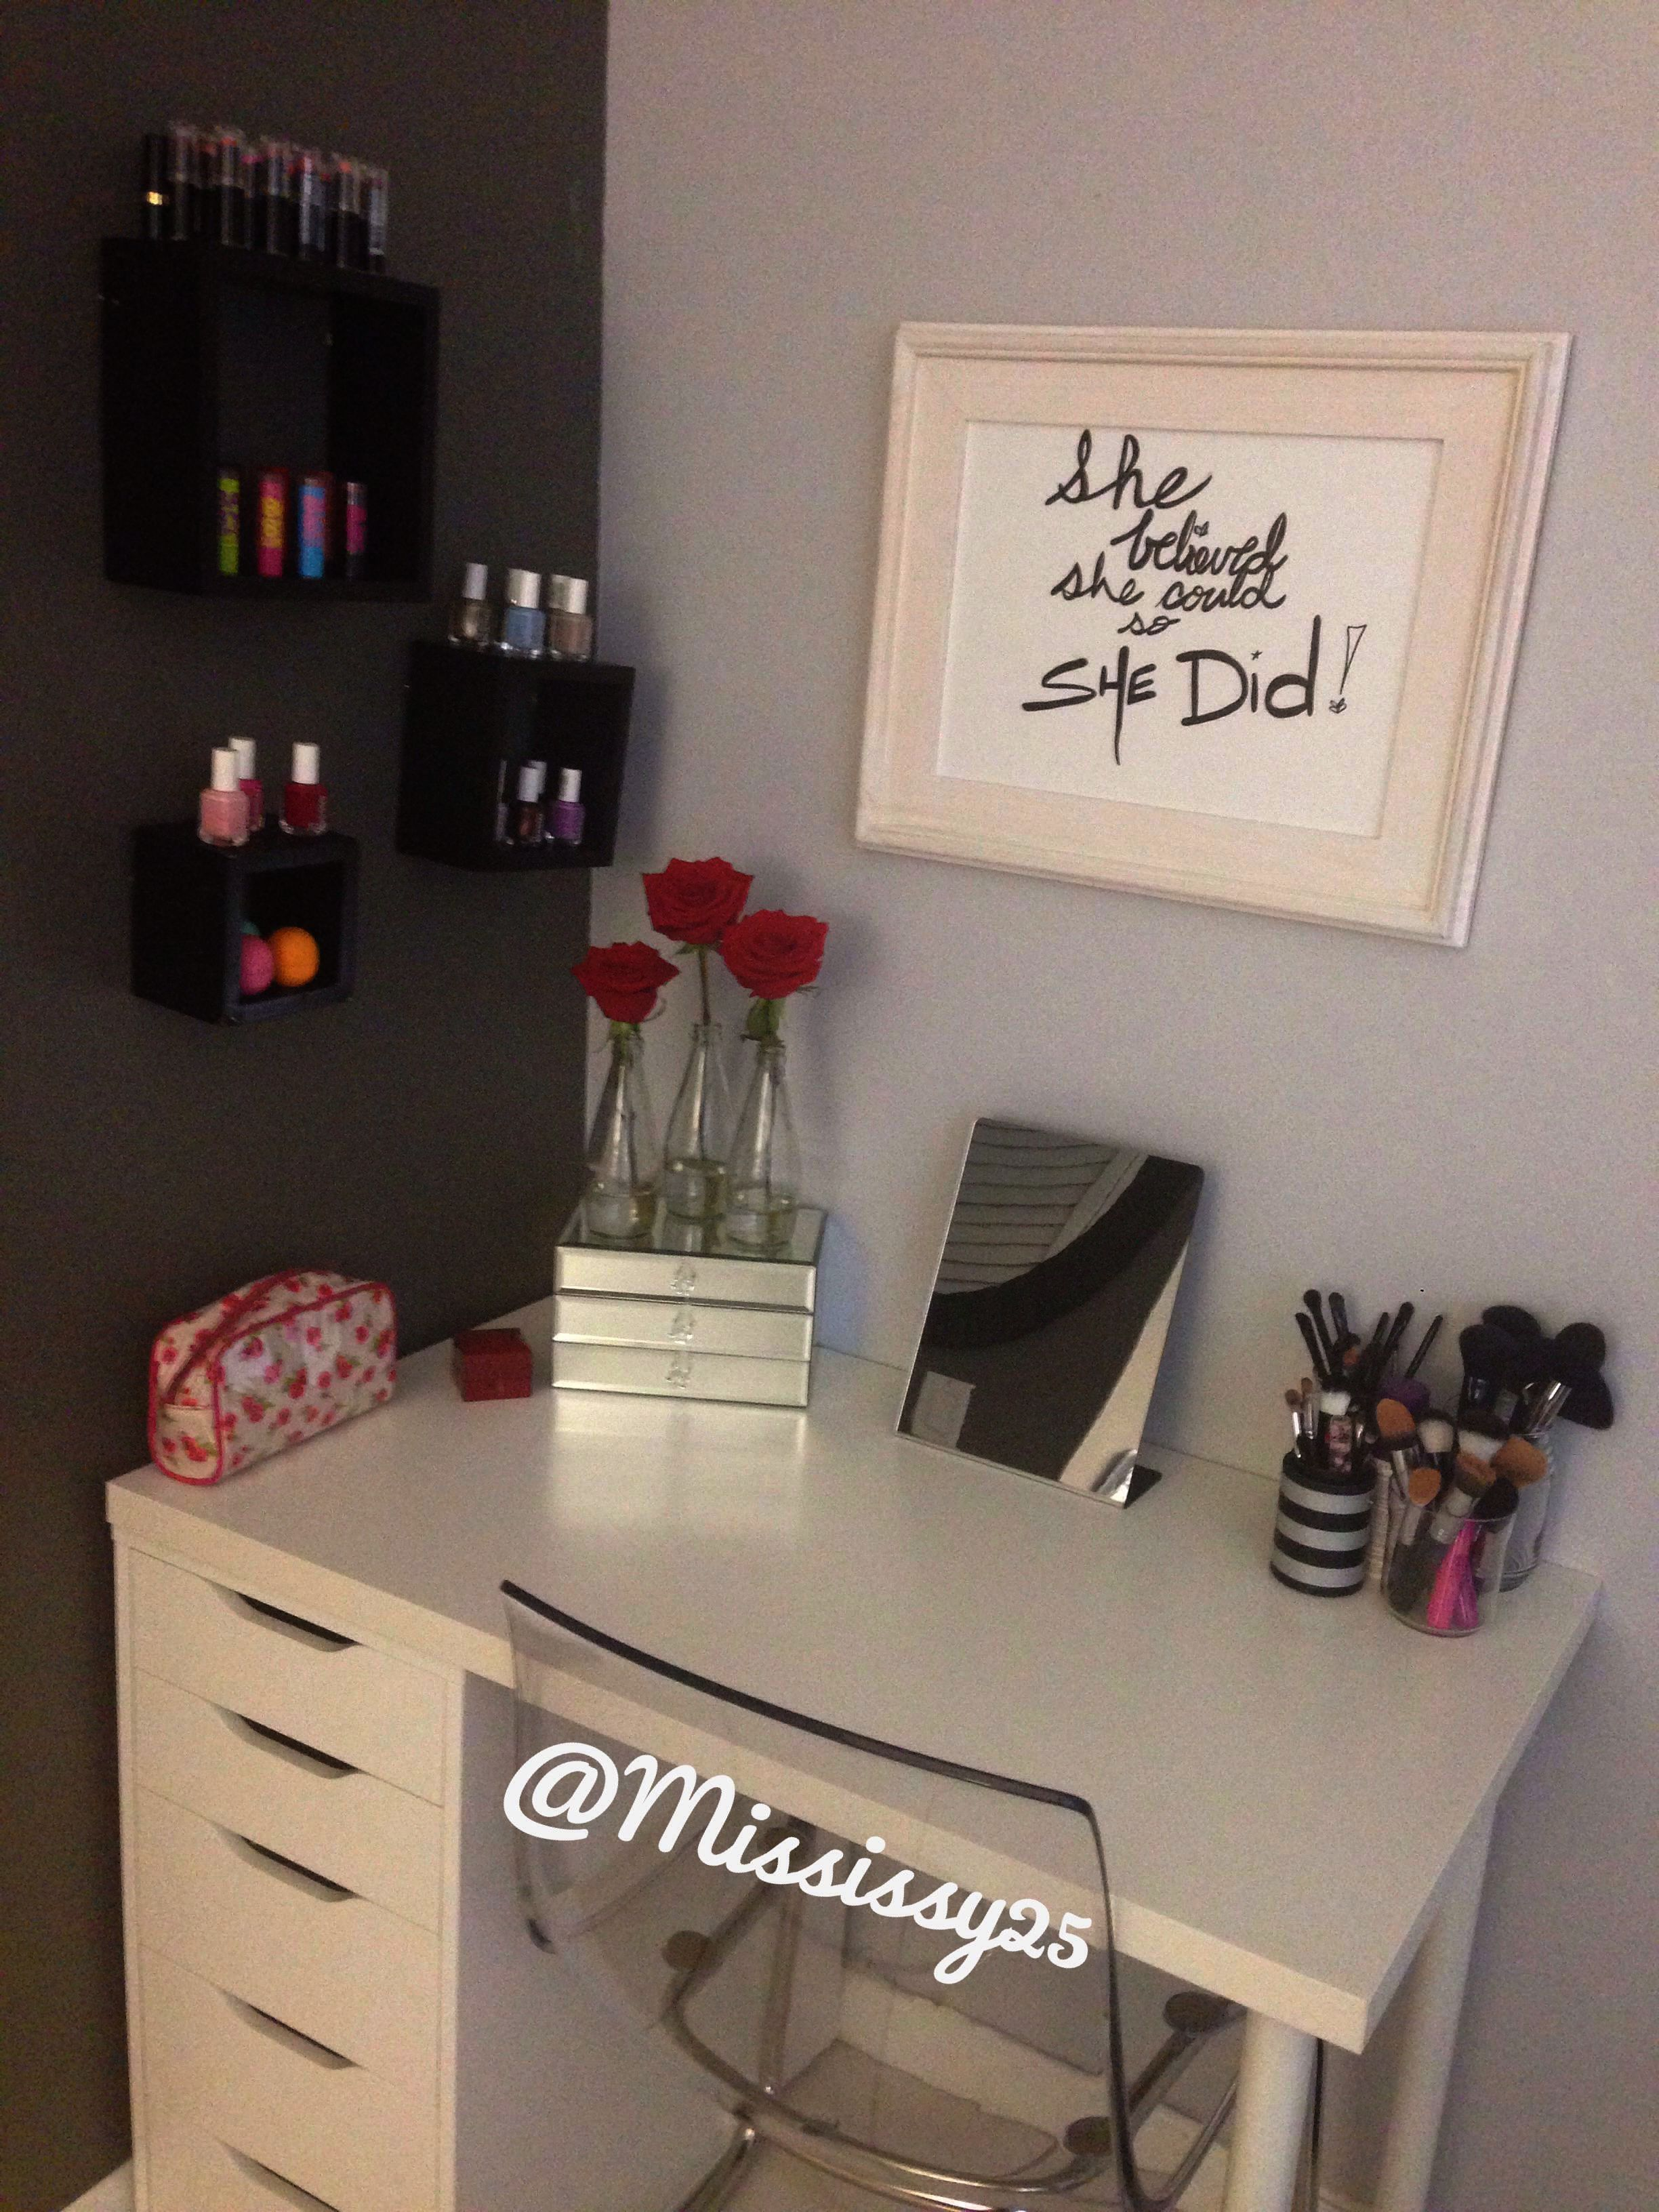 Makeup Brushes Tarte Against Makeup Organizer Lipstick Ikea Vanity Beauty Room Ikea Vanity Table